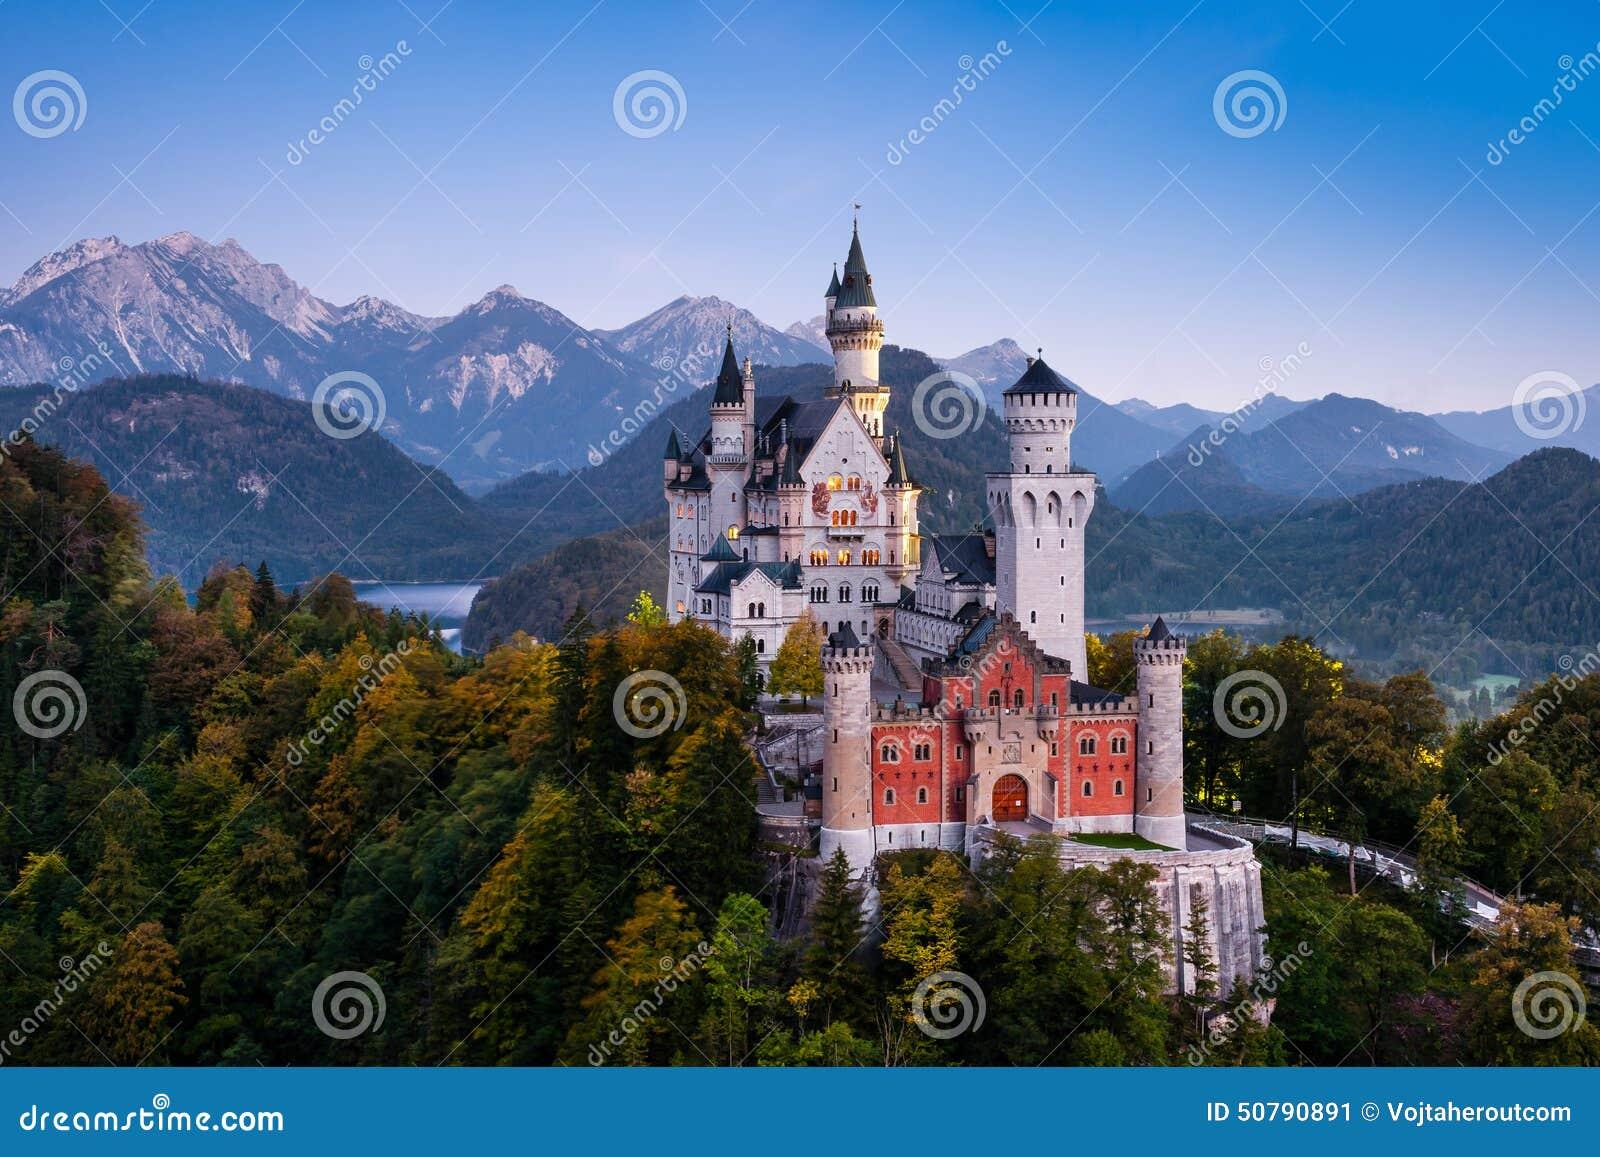 Famous Neuschwanstein Castle in Bavaria, Germany